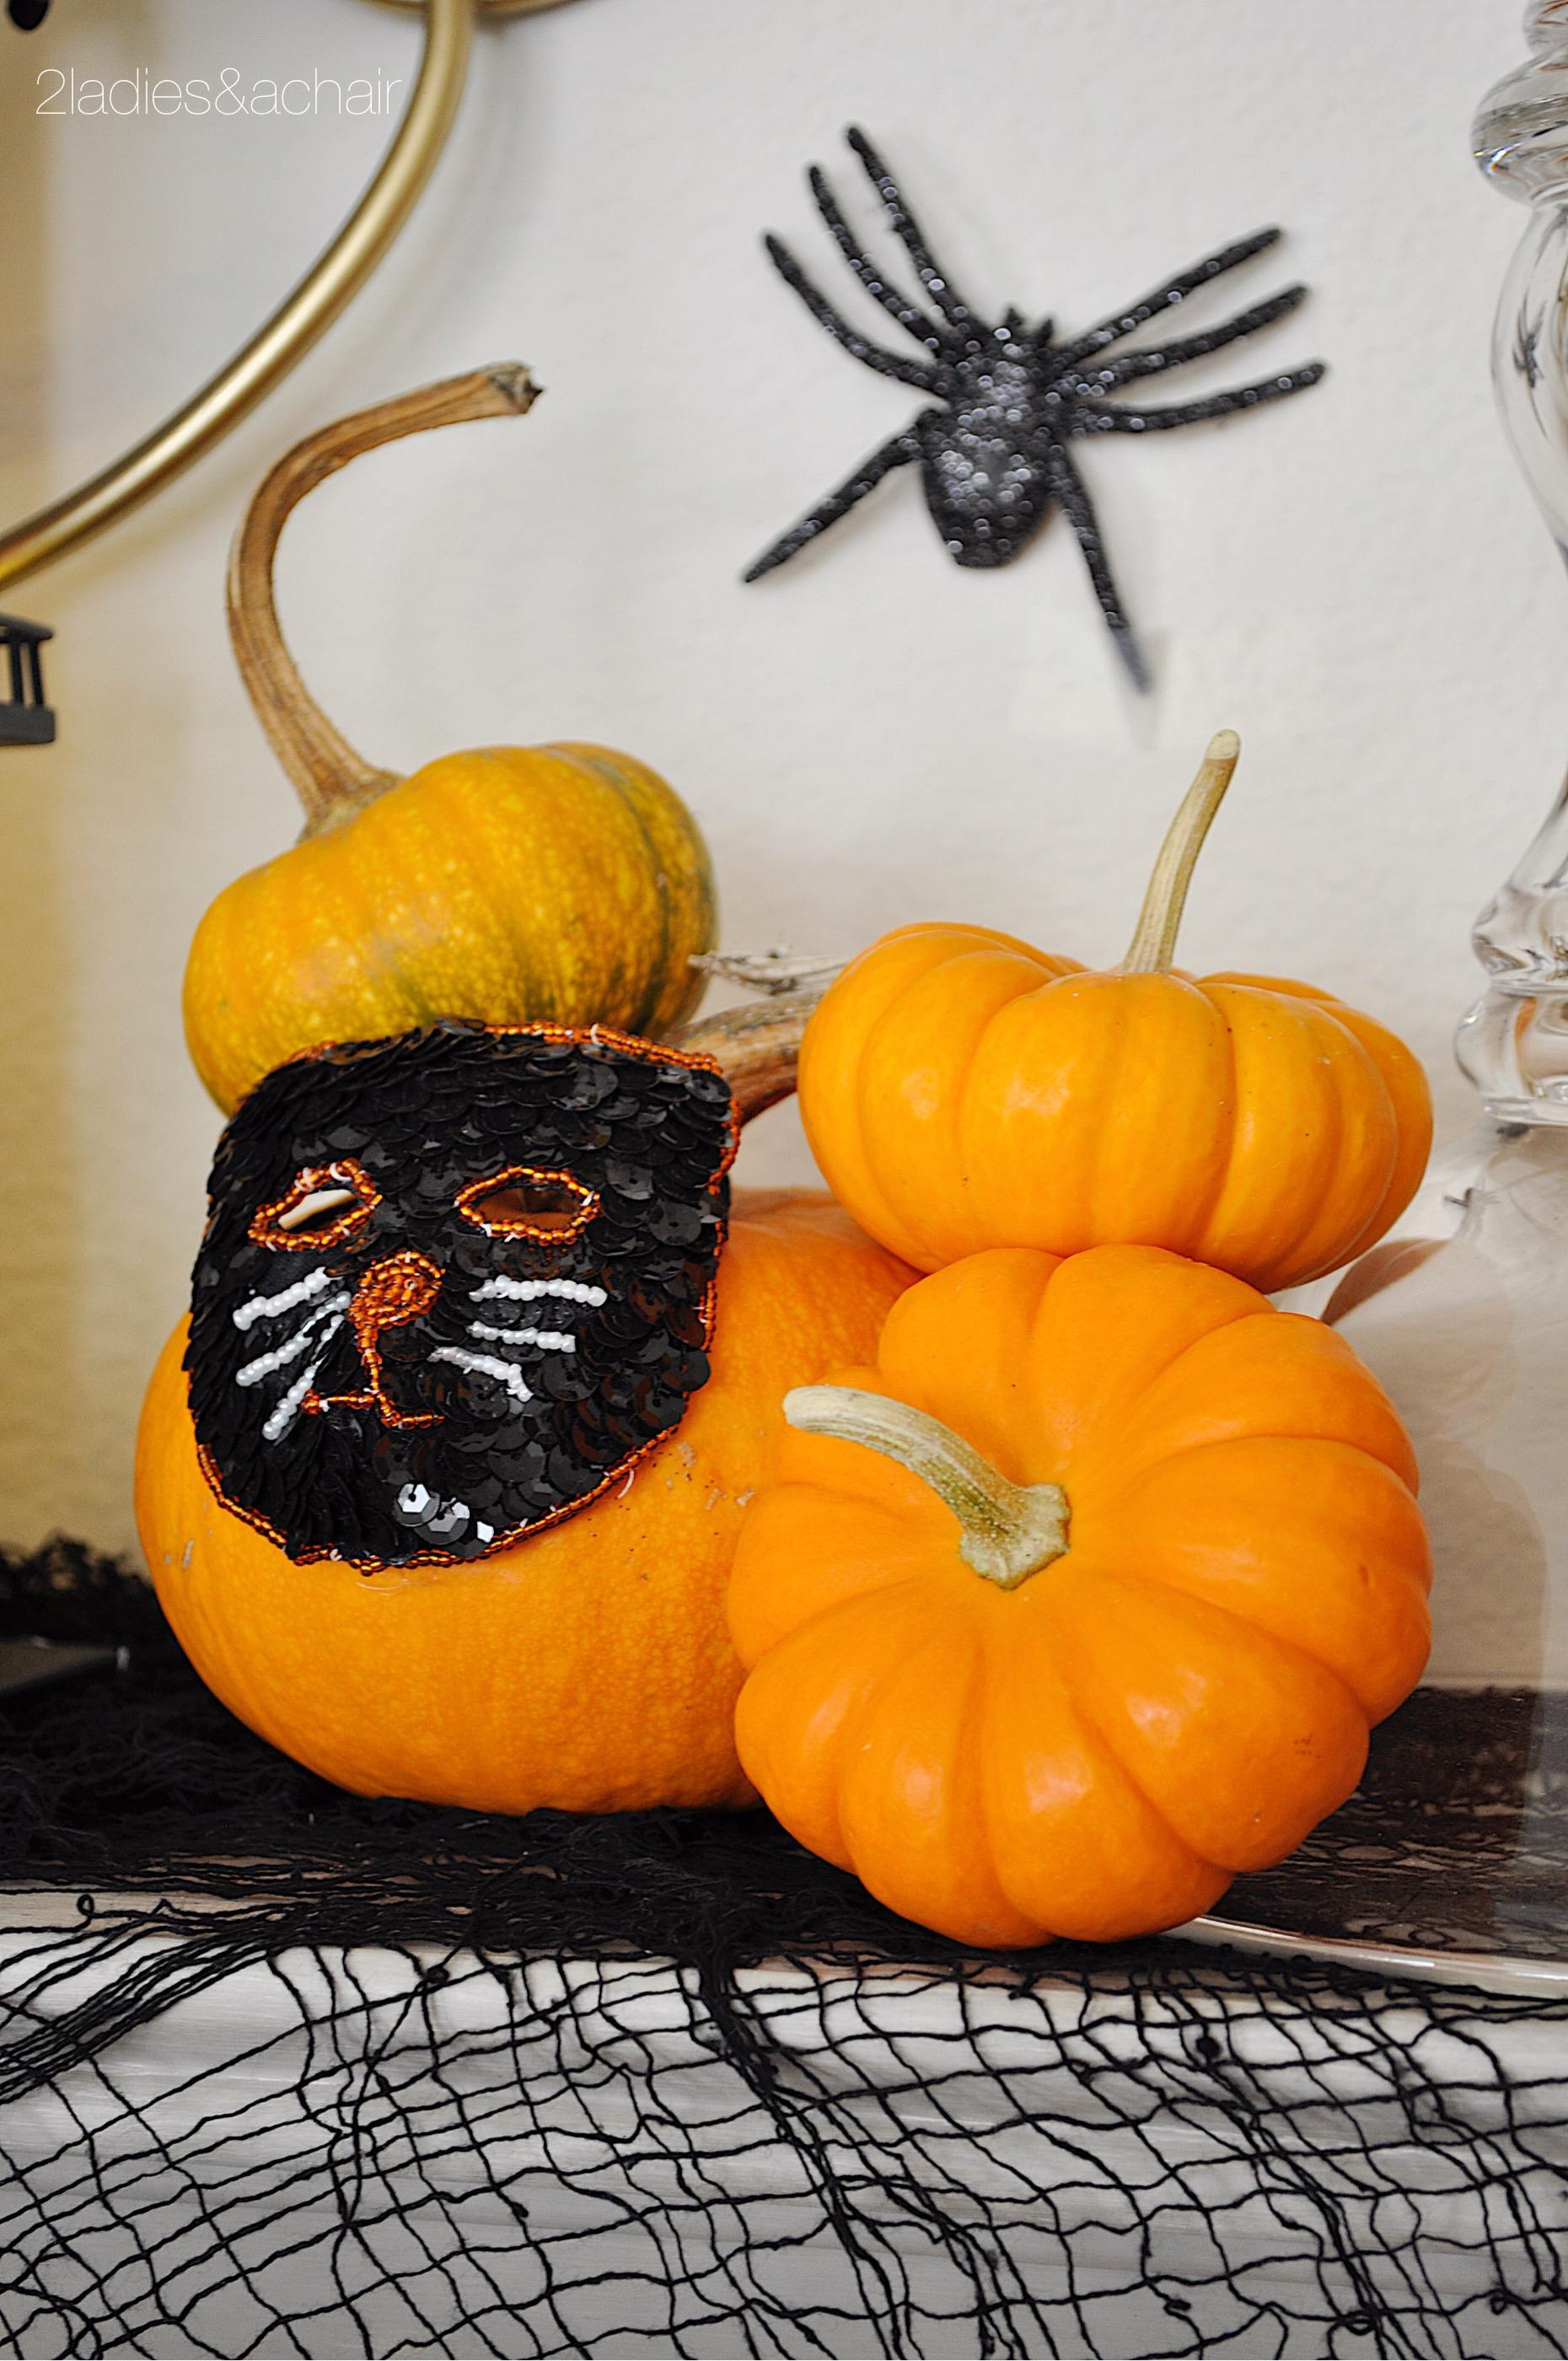 halloween mantel decorations IMG_8227.JPG